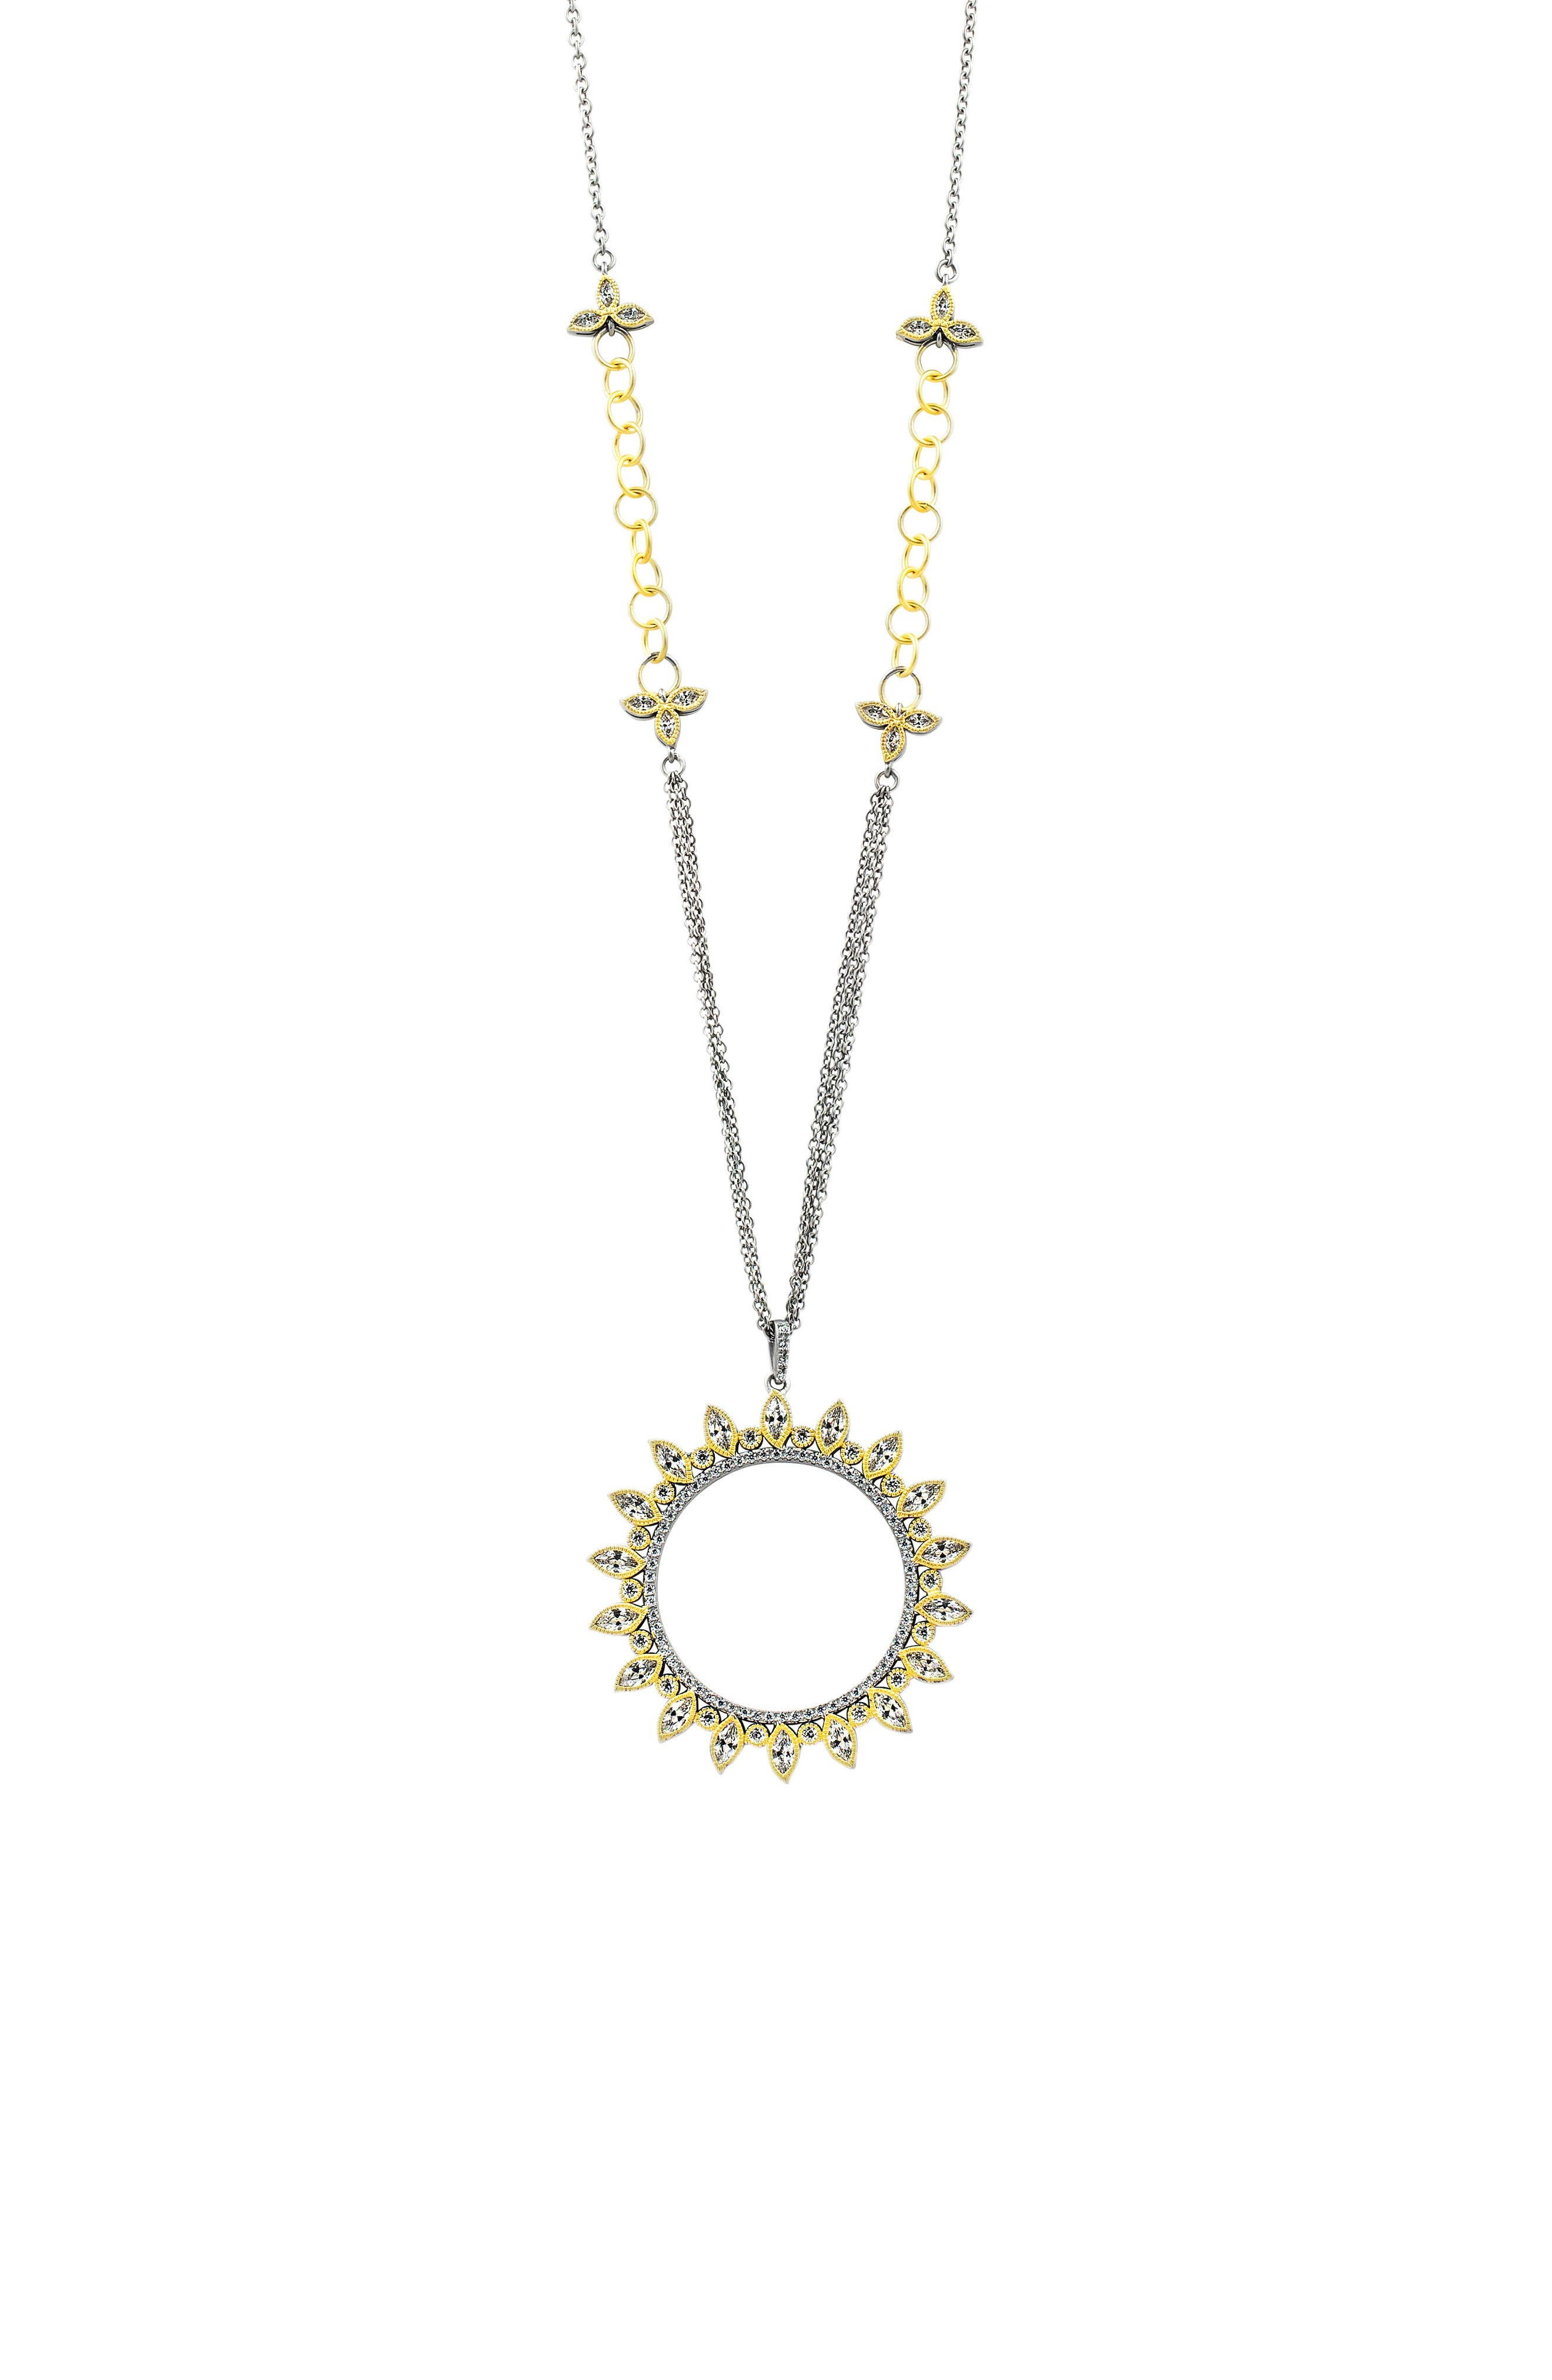 FREIDA ROTHMAN Fleur Bloom Openwork Pendant Necklace